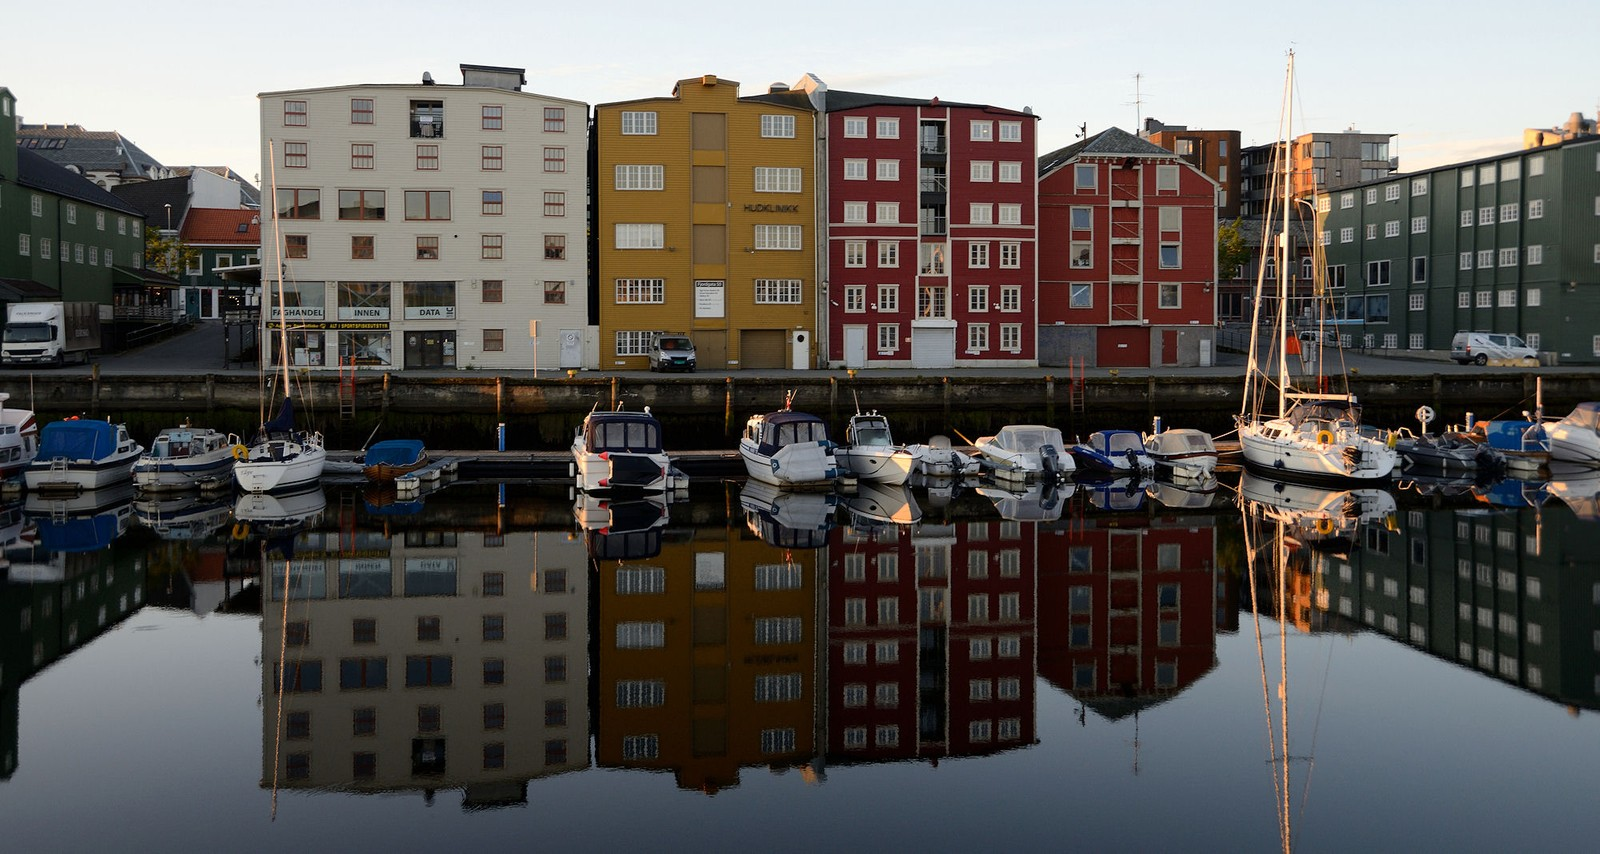 Bryggene speiler seg i Kanalen i Trondheim